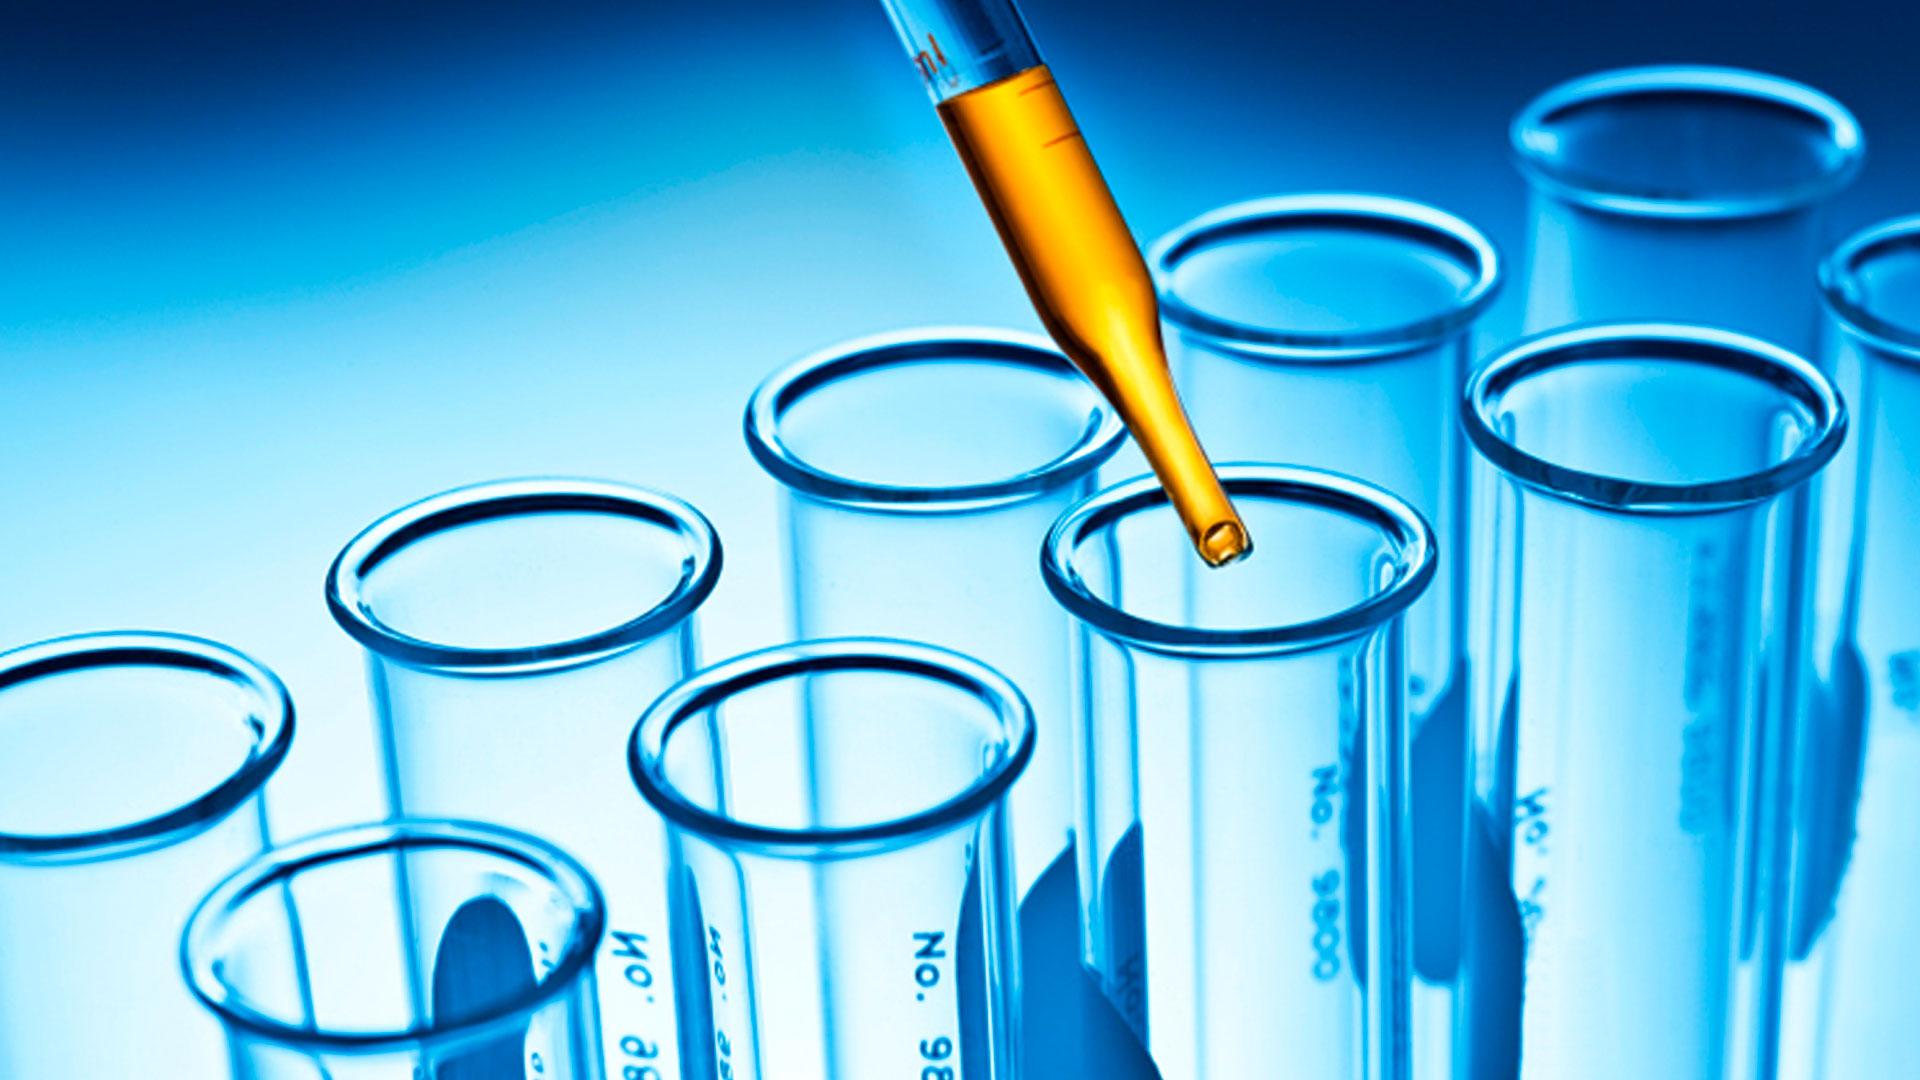 Diabete, un test urinario può rilevare la futura malattia renale. Studio PRIORITY #EASD19